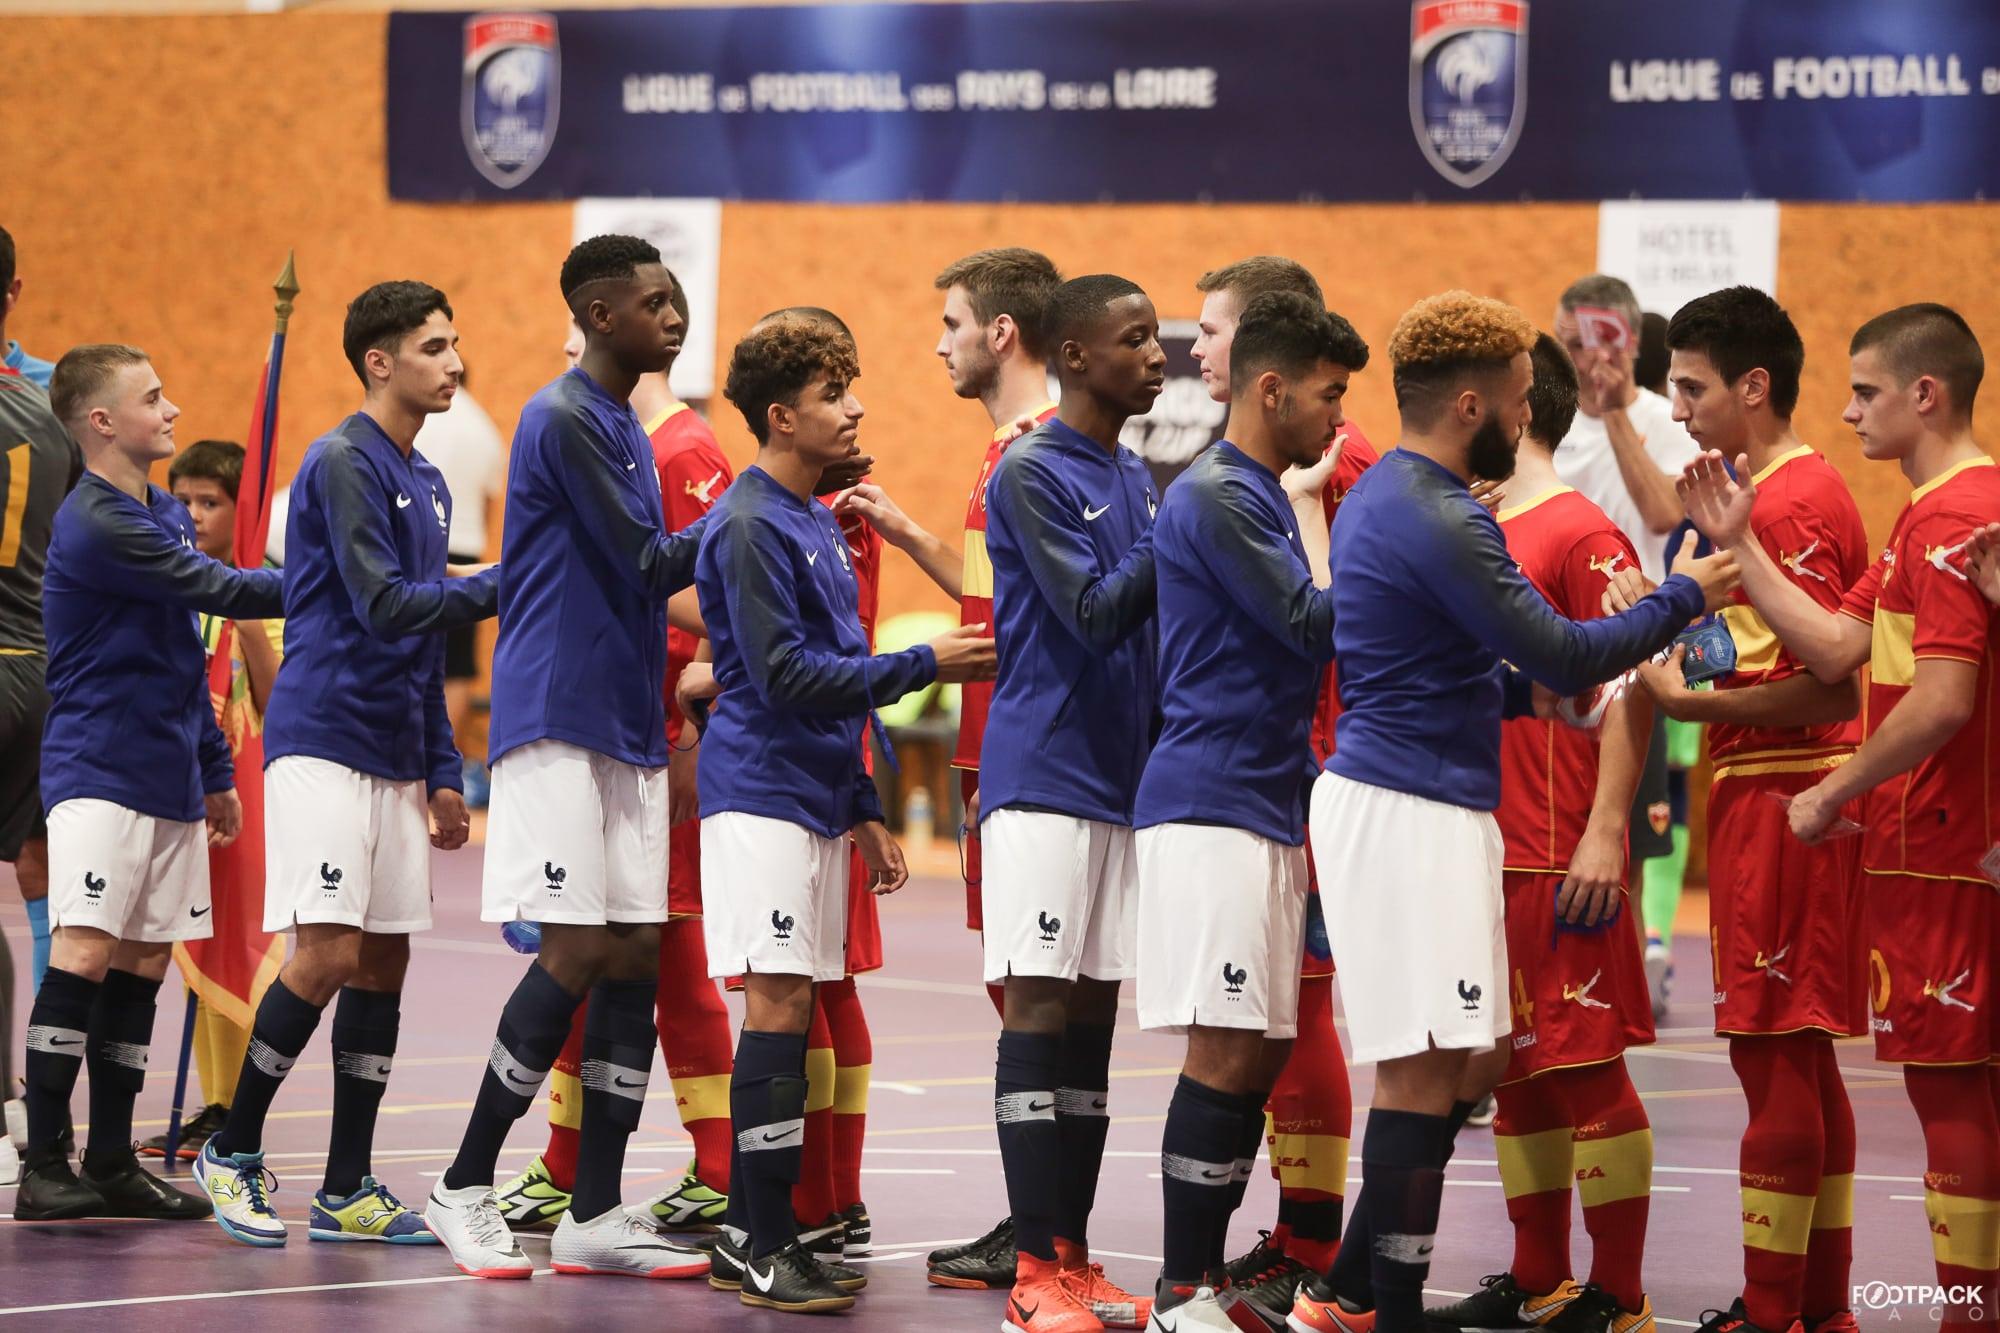 Montaigu-futsal-cup-2018-2